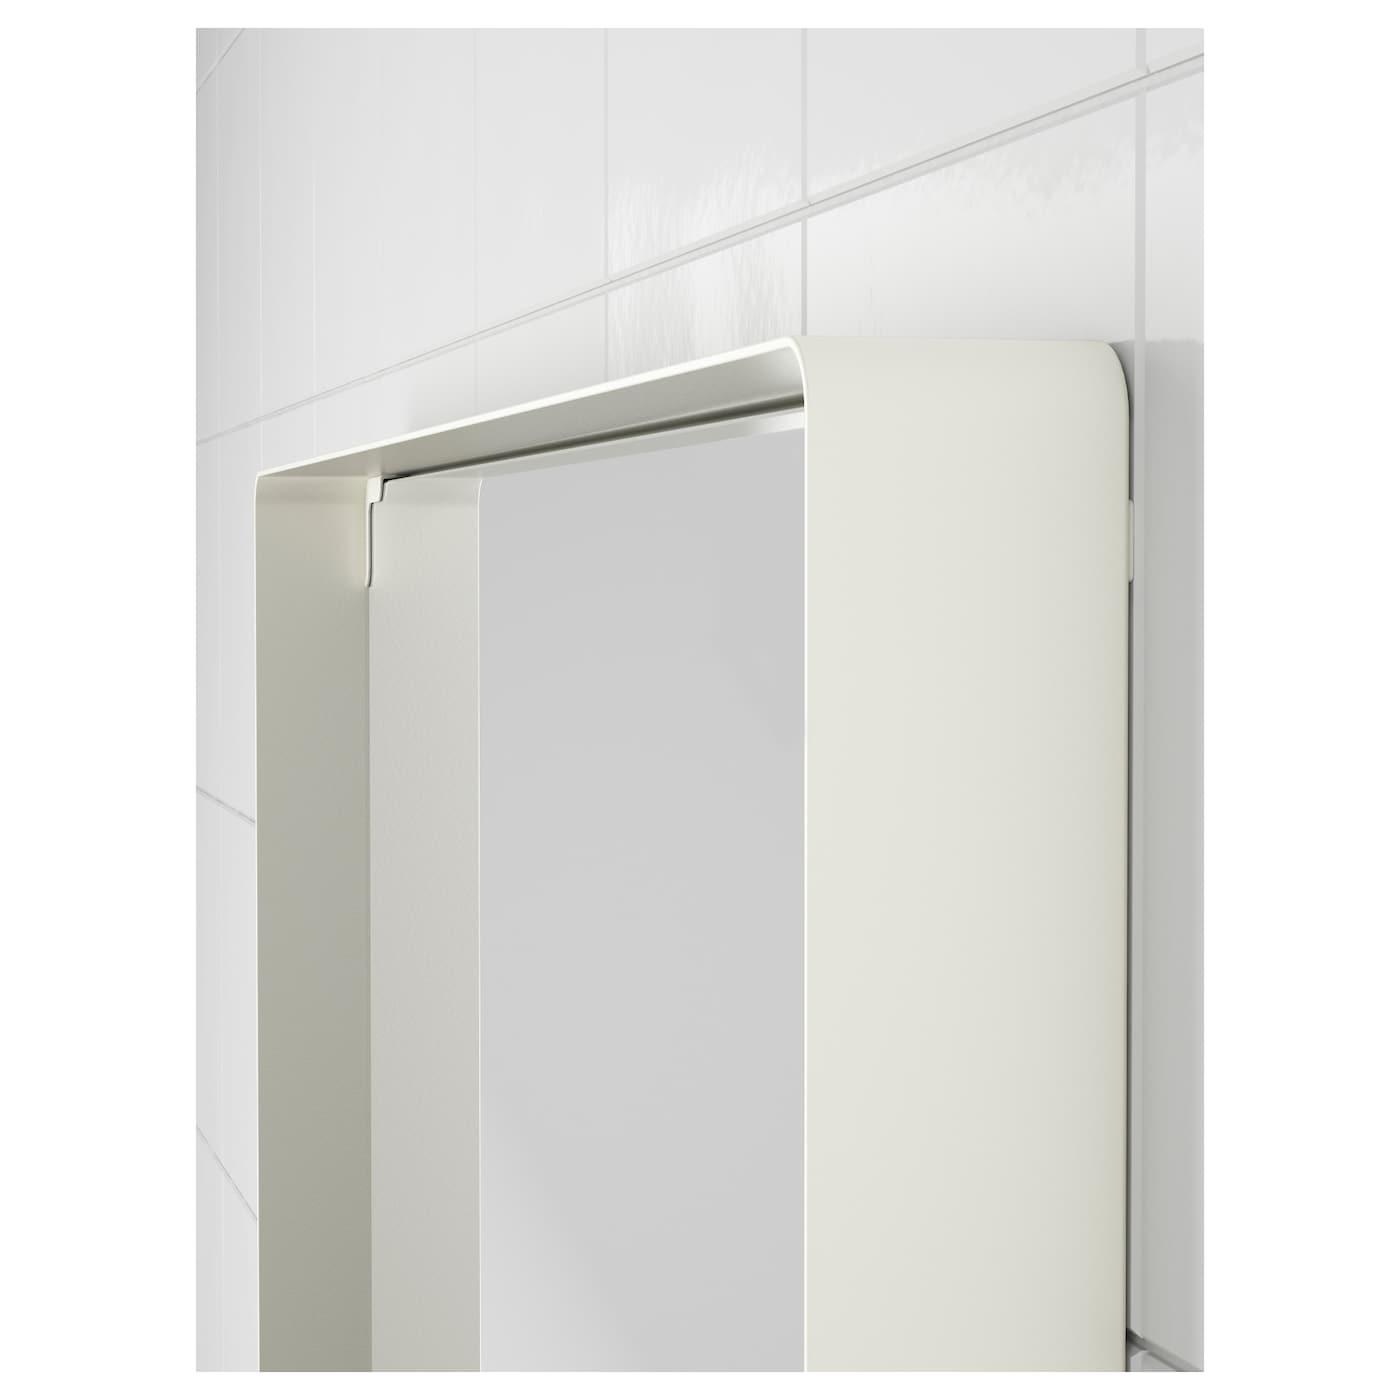 Enudden Mirror White 58x40 Cm Ikea